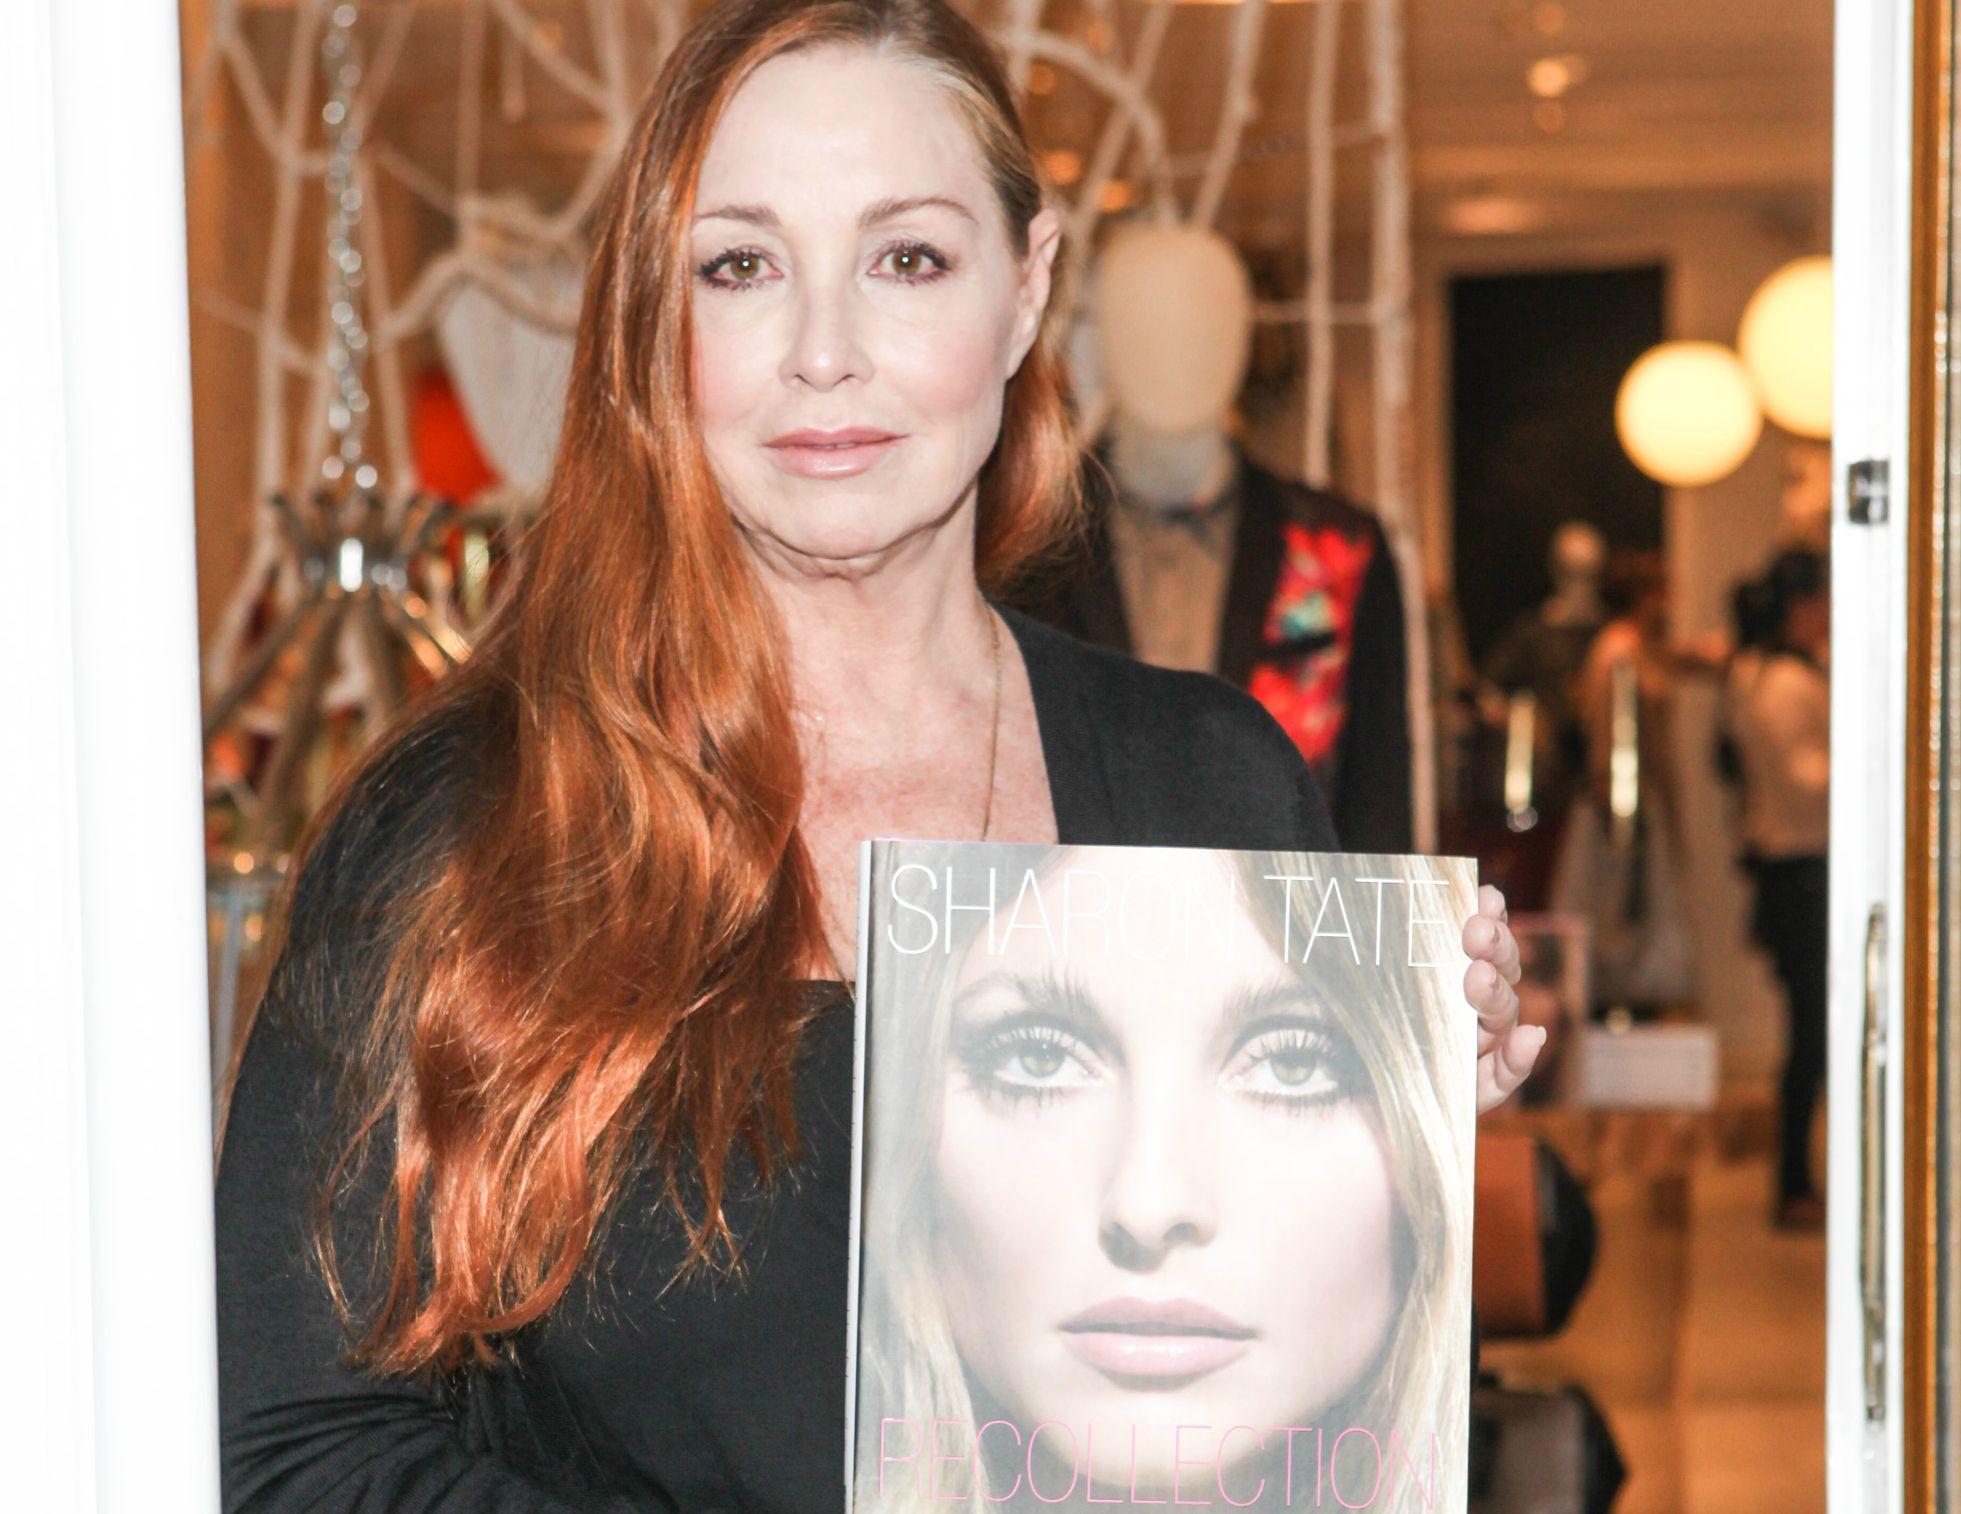 Debra Tate - sister of Sharon Tate